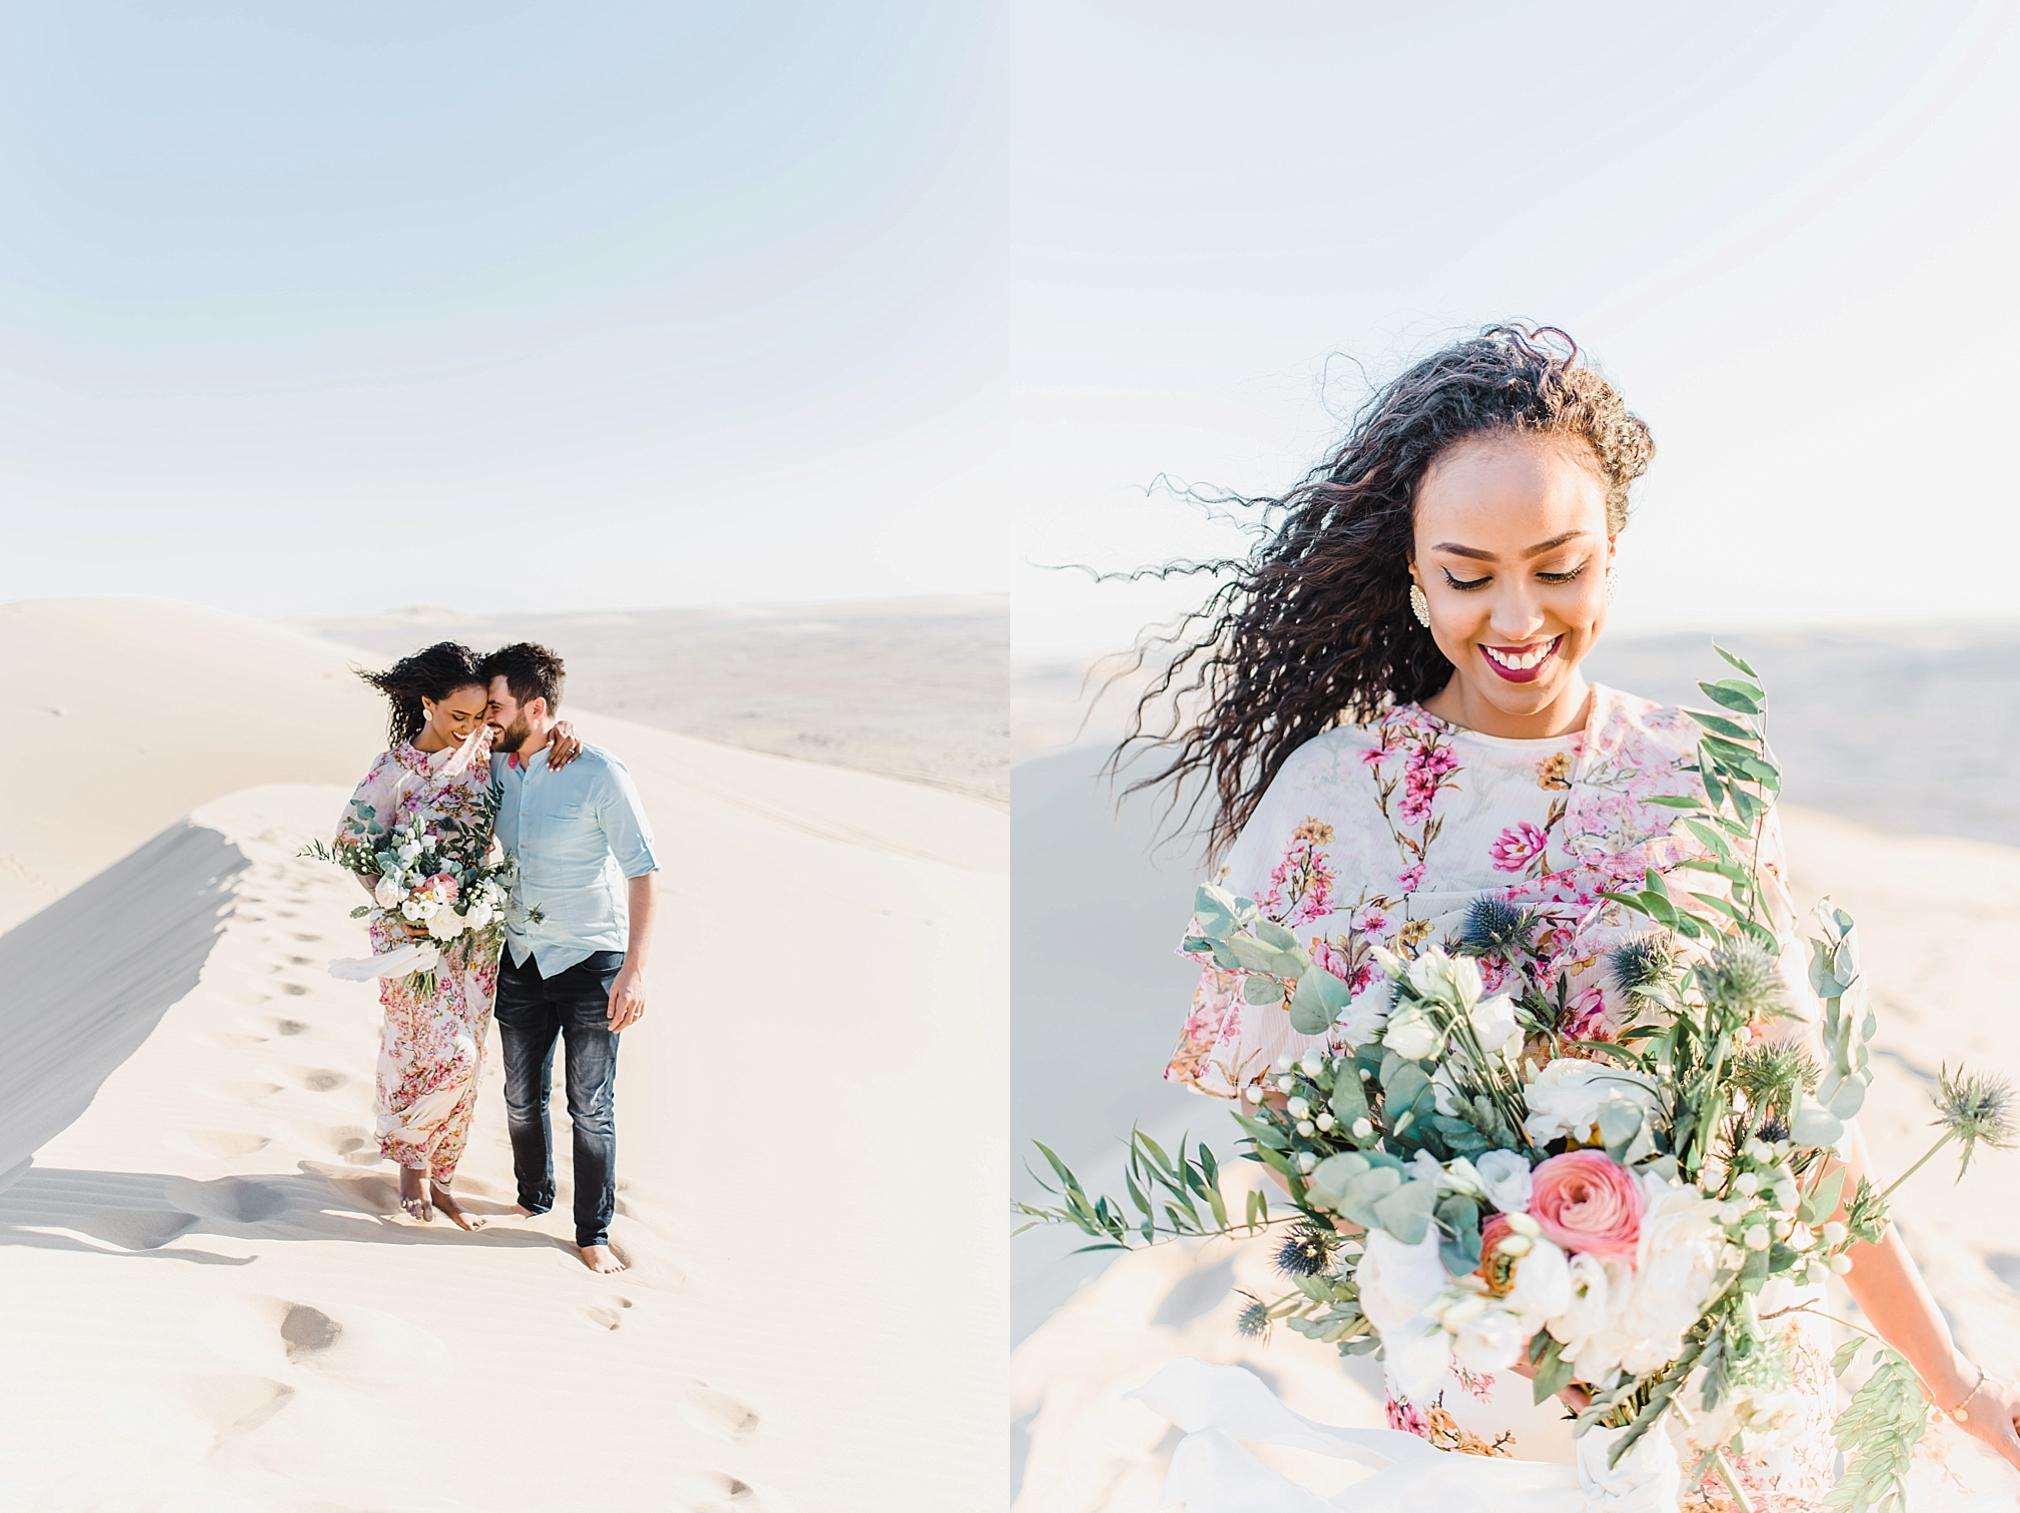 Singing Sand Dunes Desert Love Shoot   Ali and Batoul Photography_0001.jpg